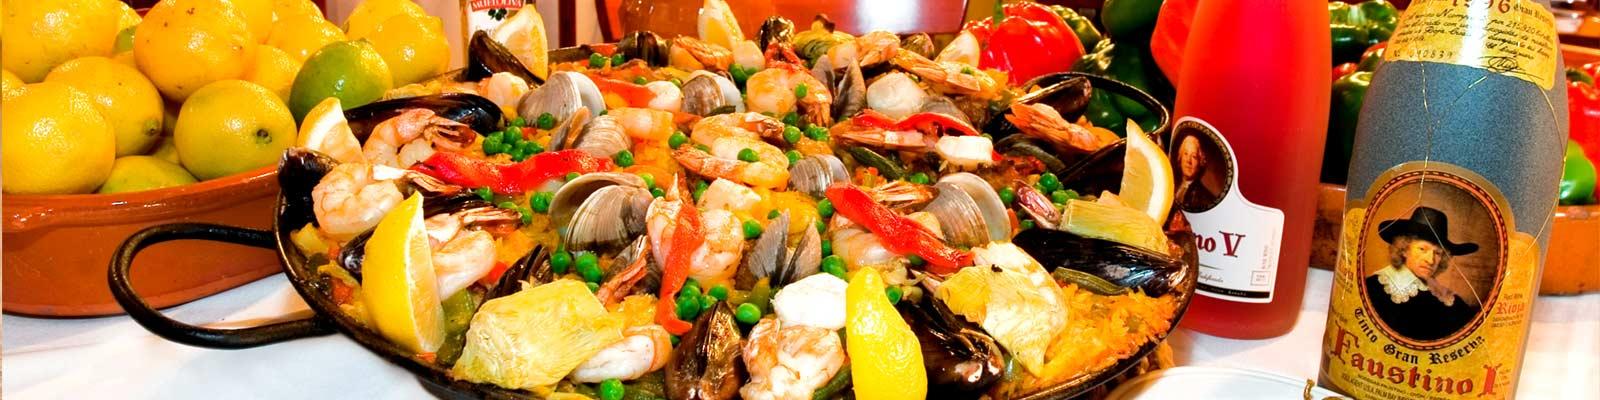 paella-page.jpg